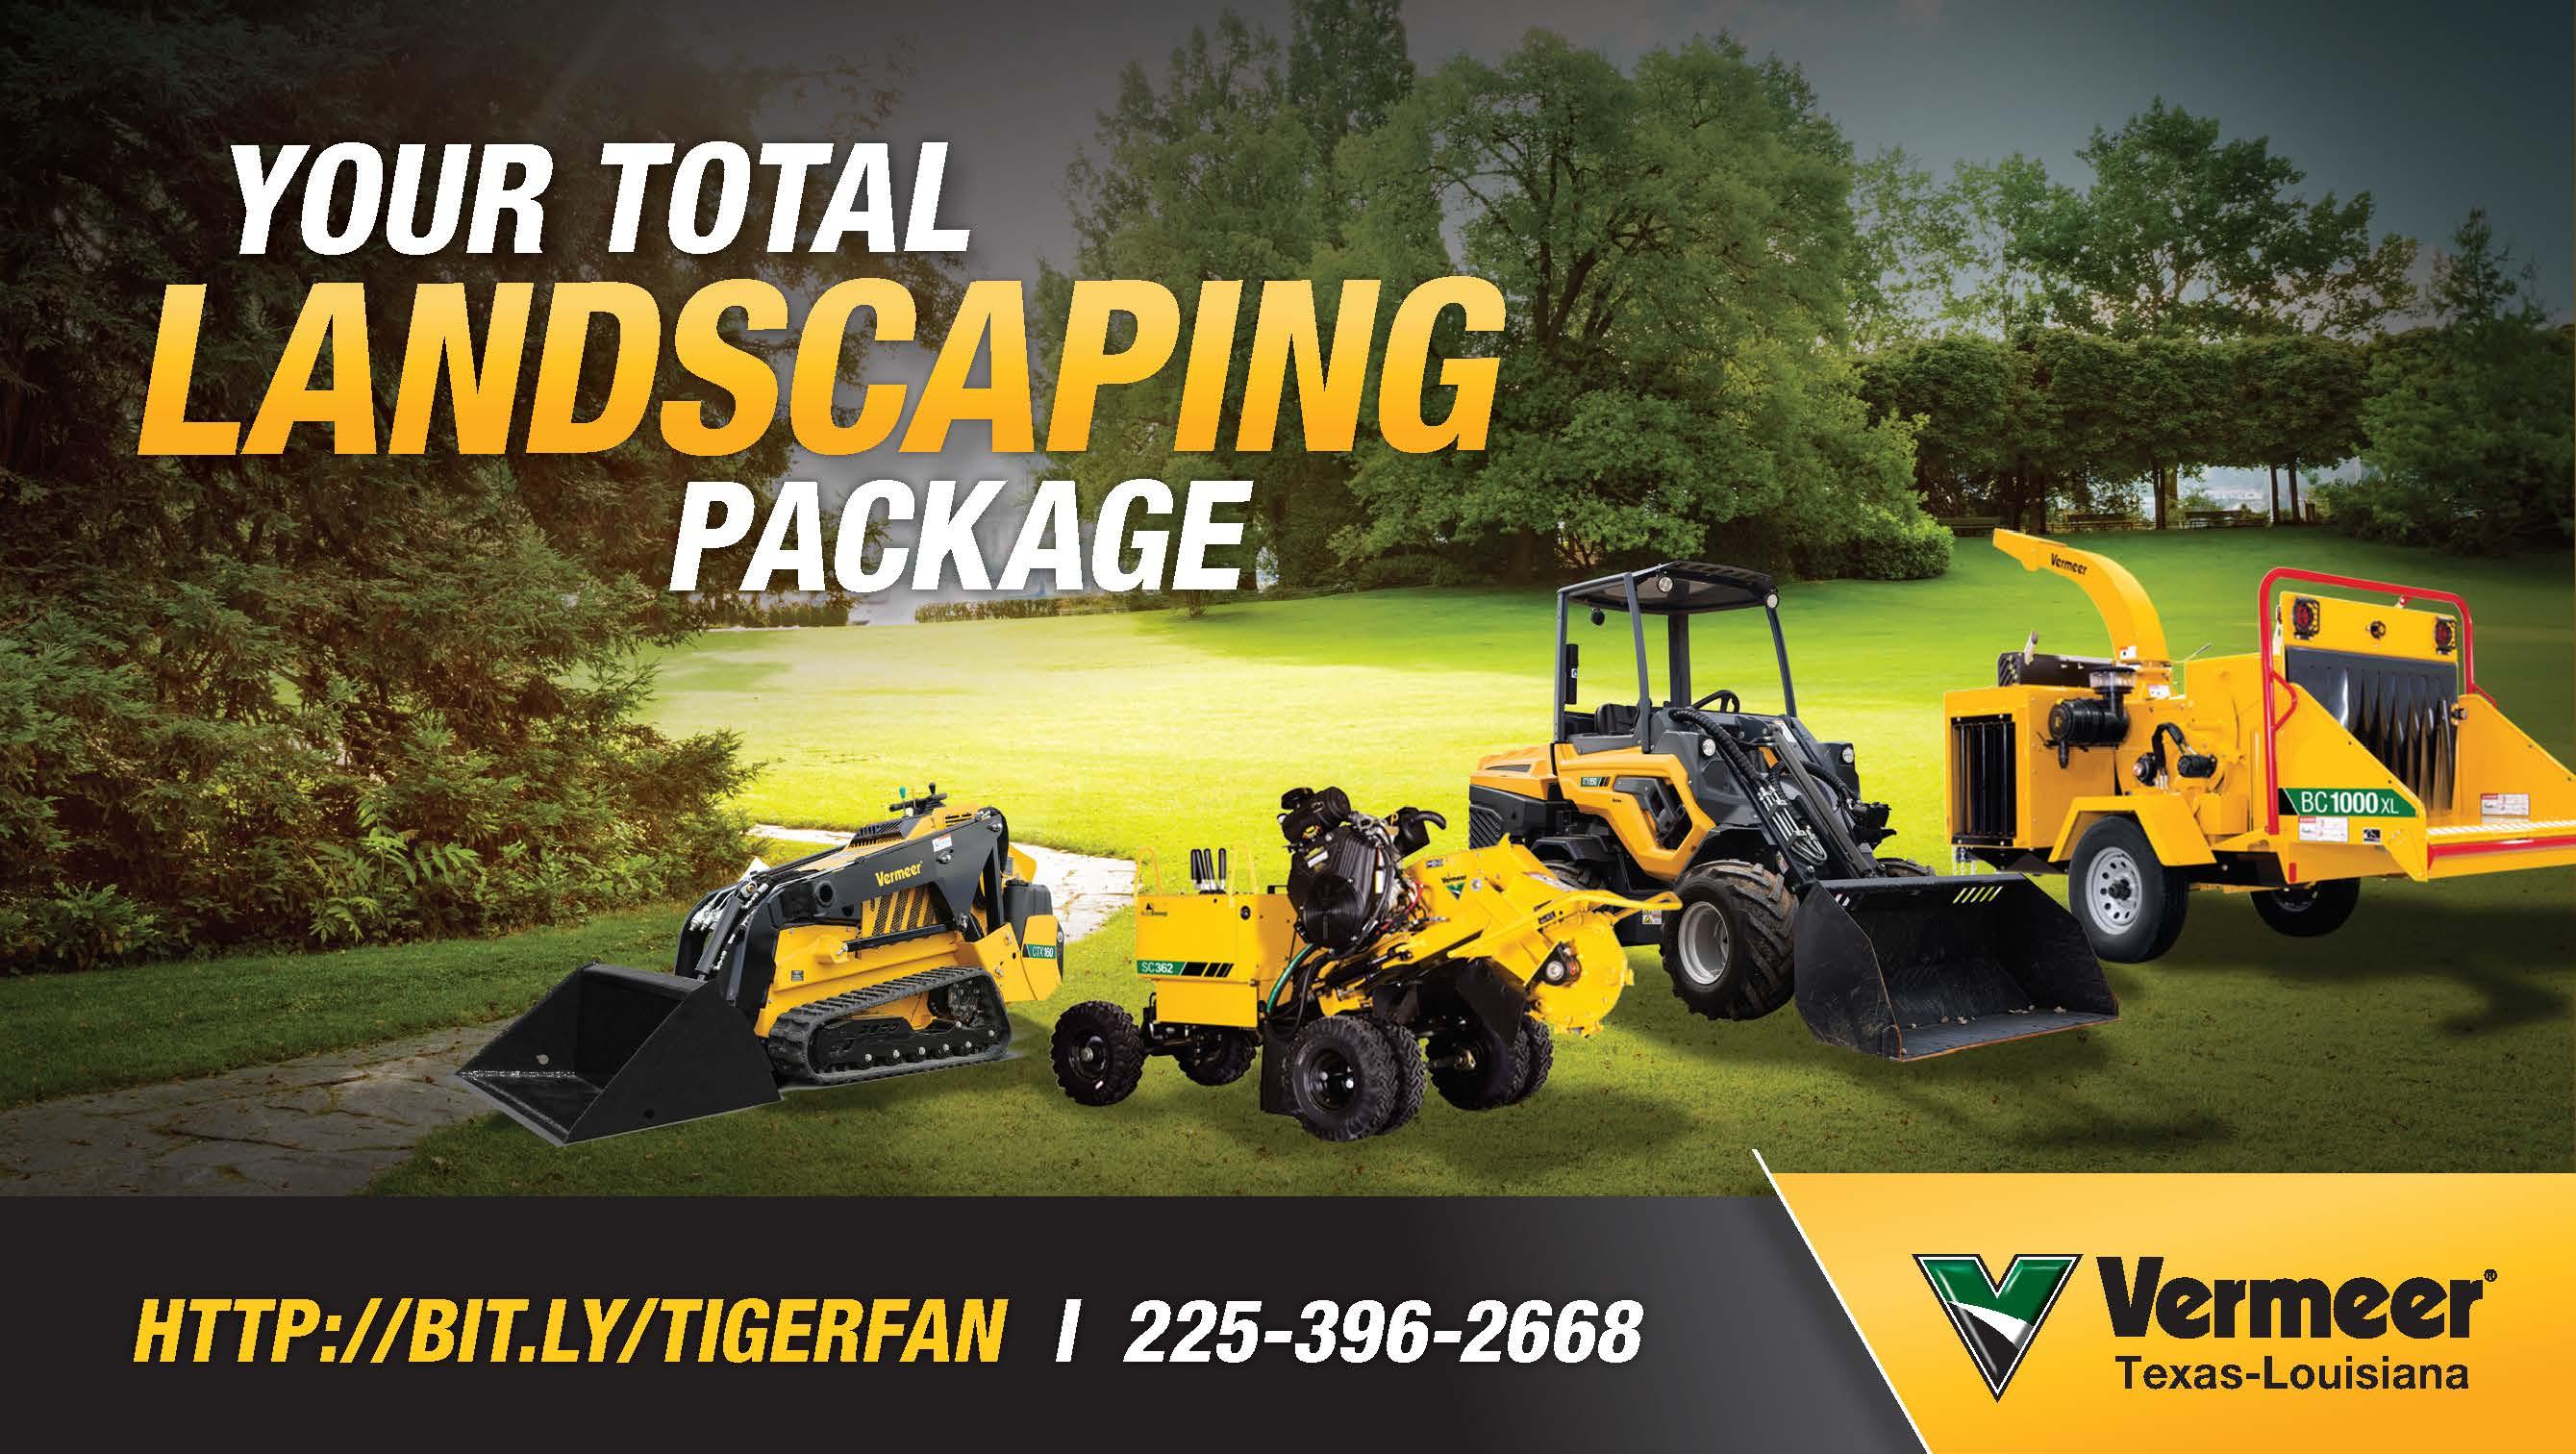 Tiger Rag - Vermeer for your total landscaping package